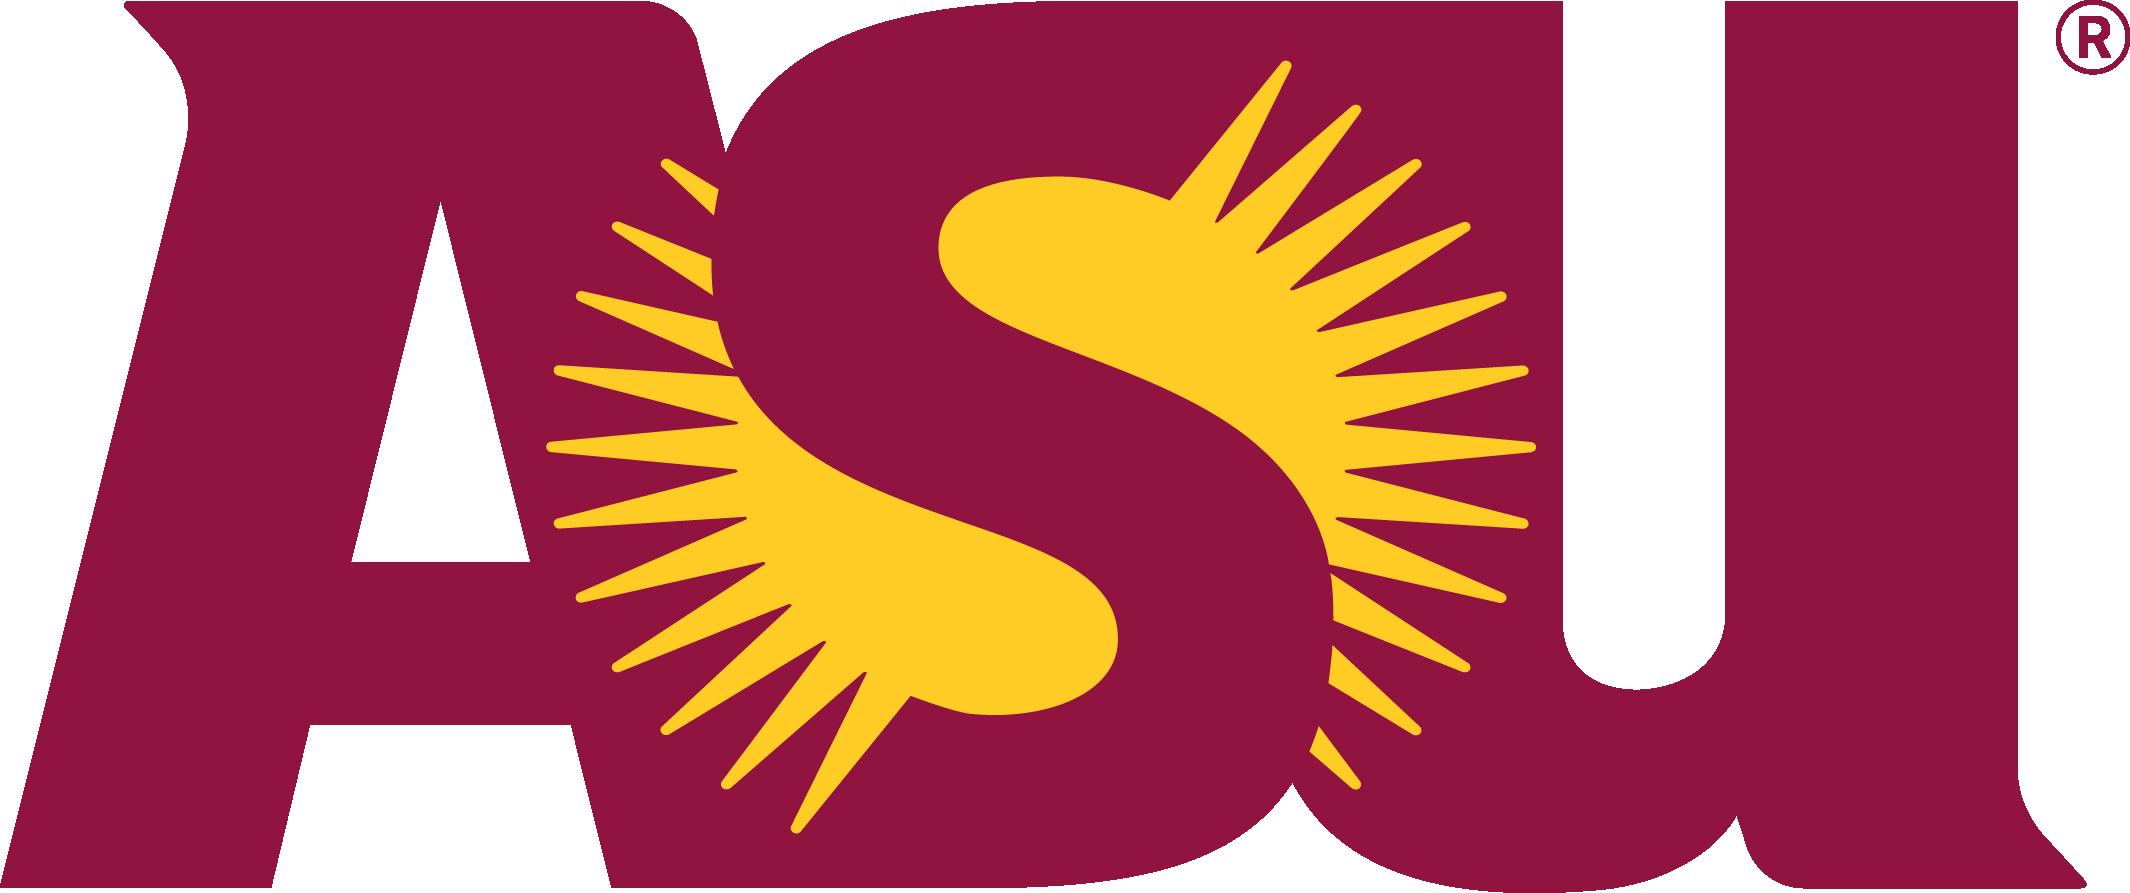 Devil clipart logo. Arizona state cliparts free